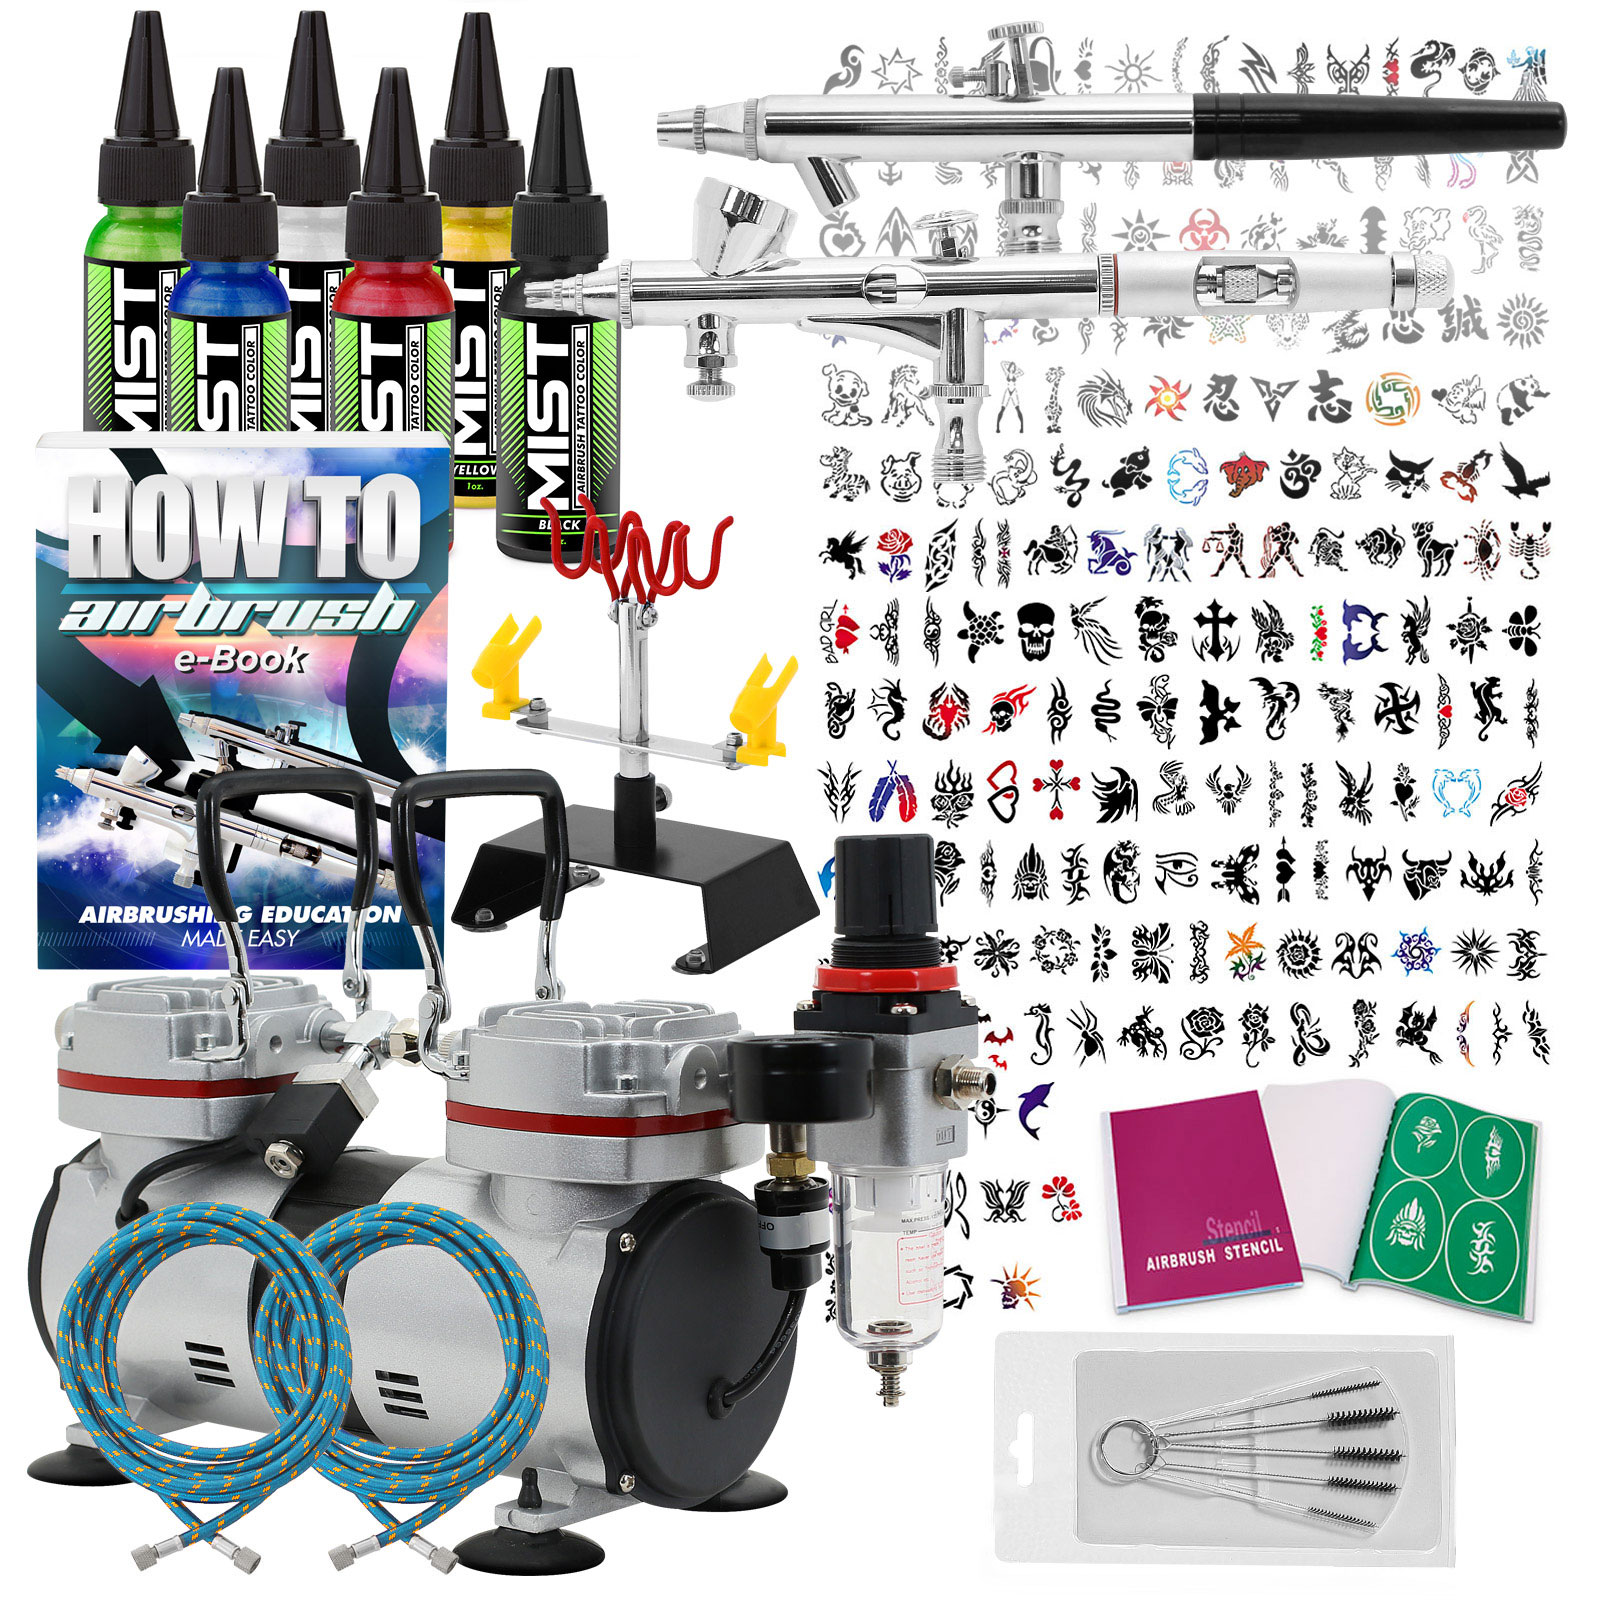 Temporary tattoo airbrush kit 2 gun set with compressor for Airbrush tattoo kit